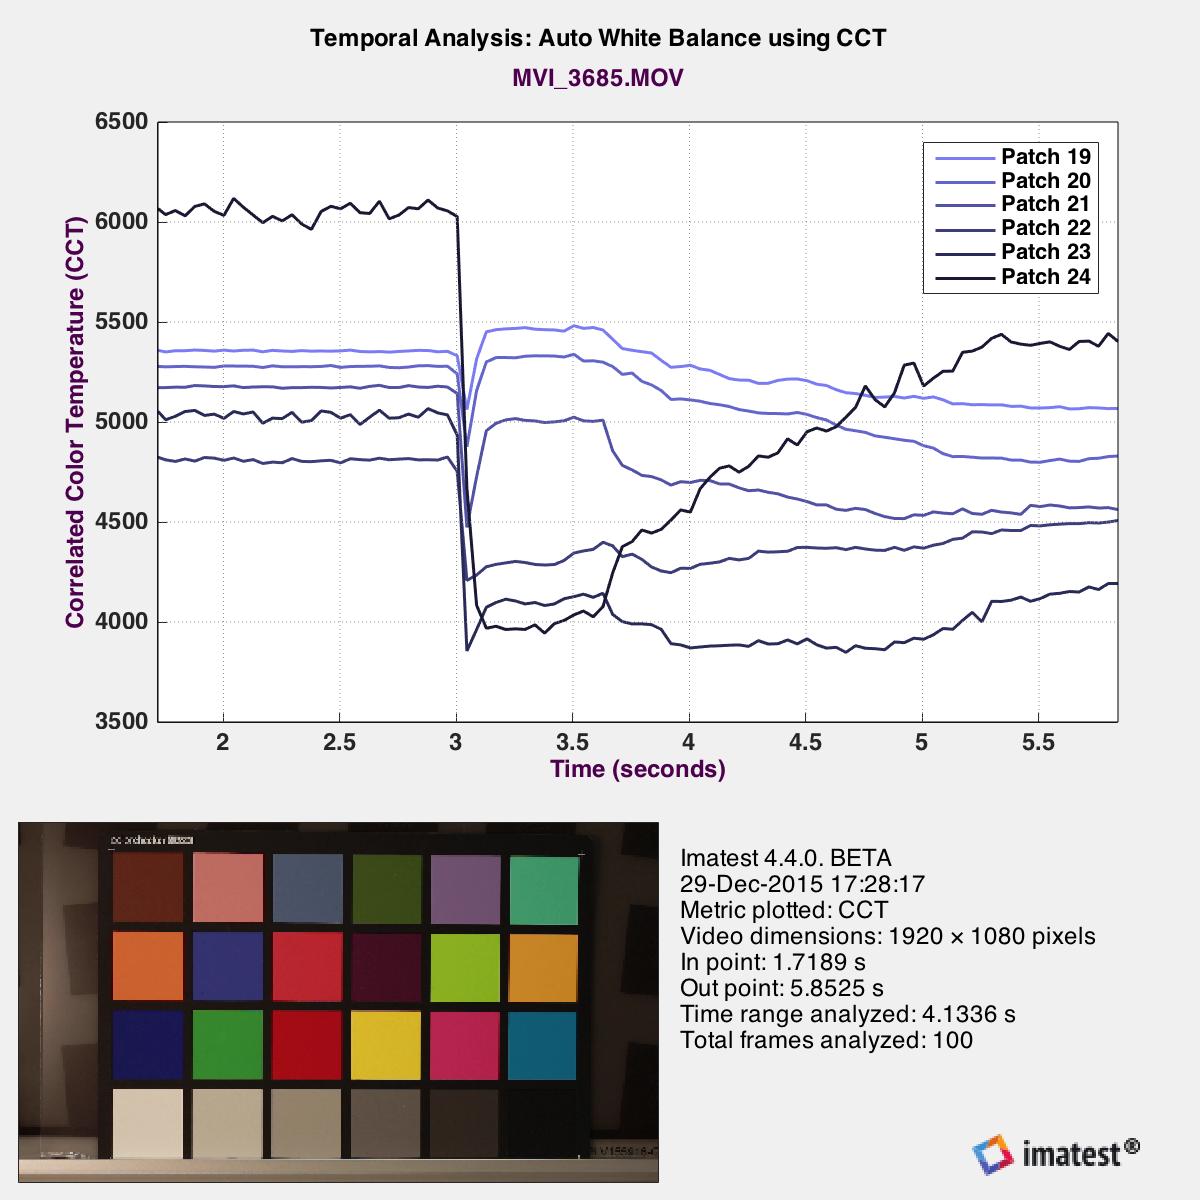 auto_white_balance_result